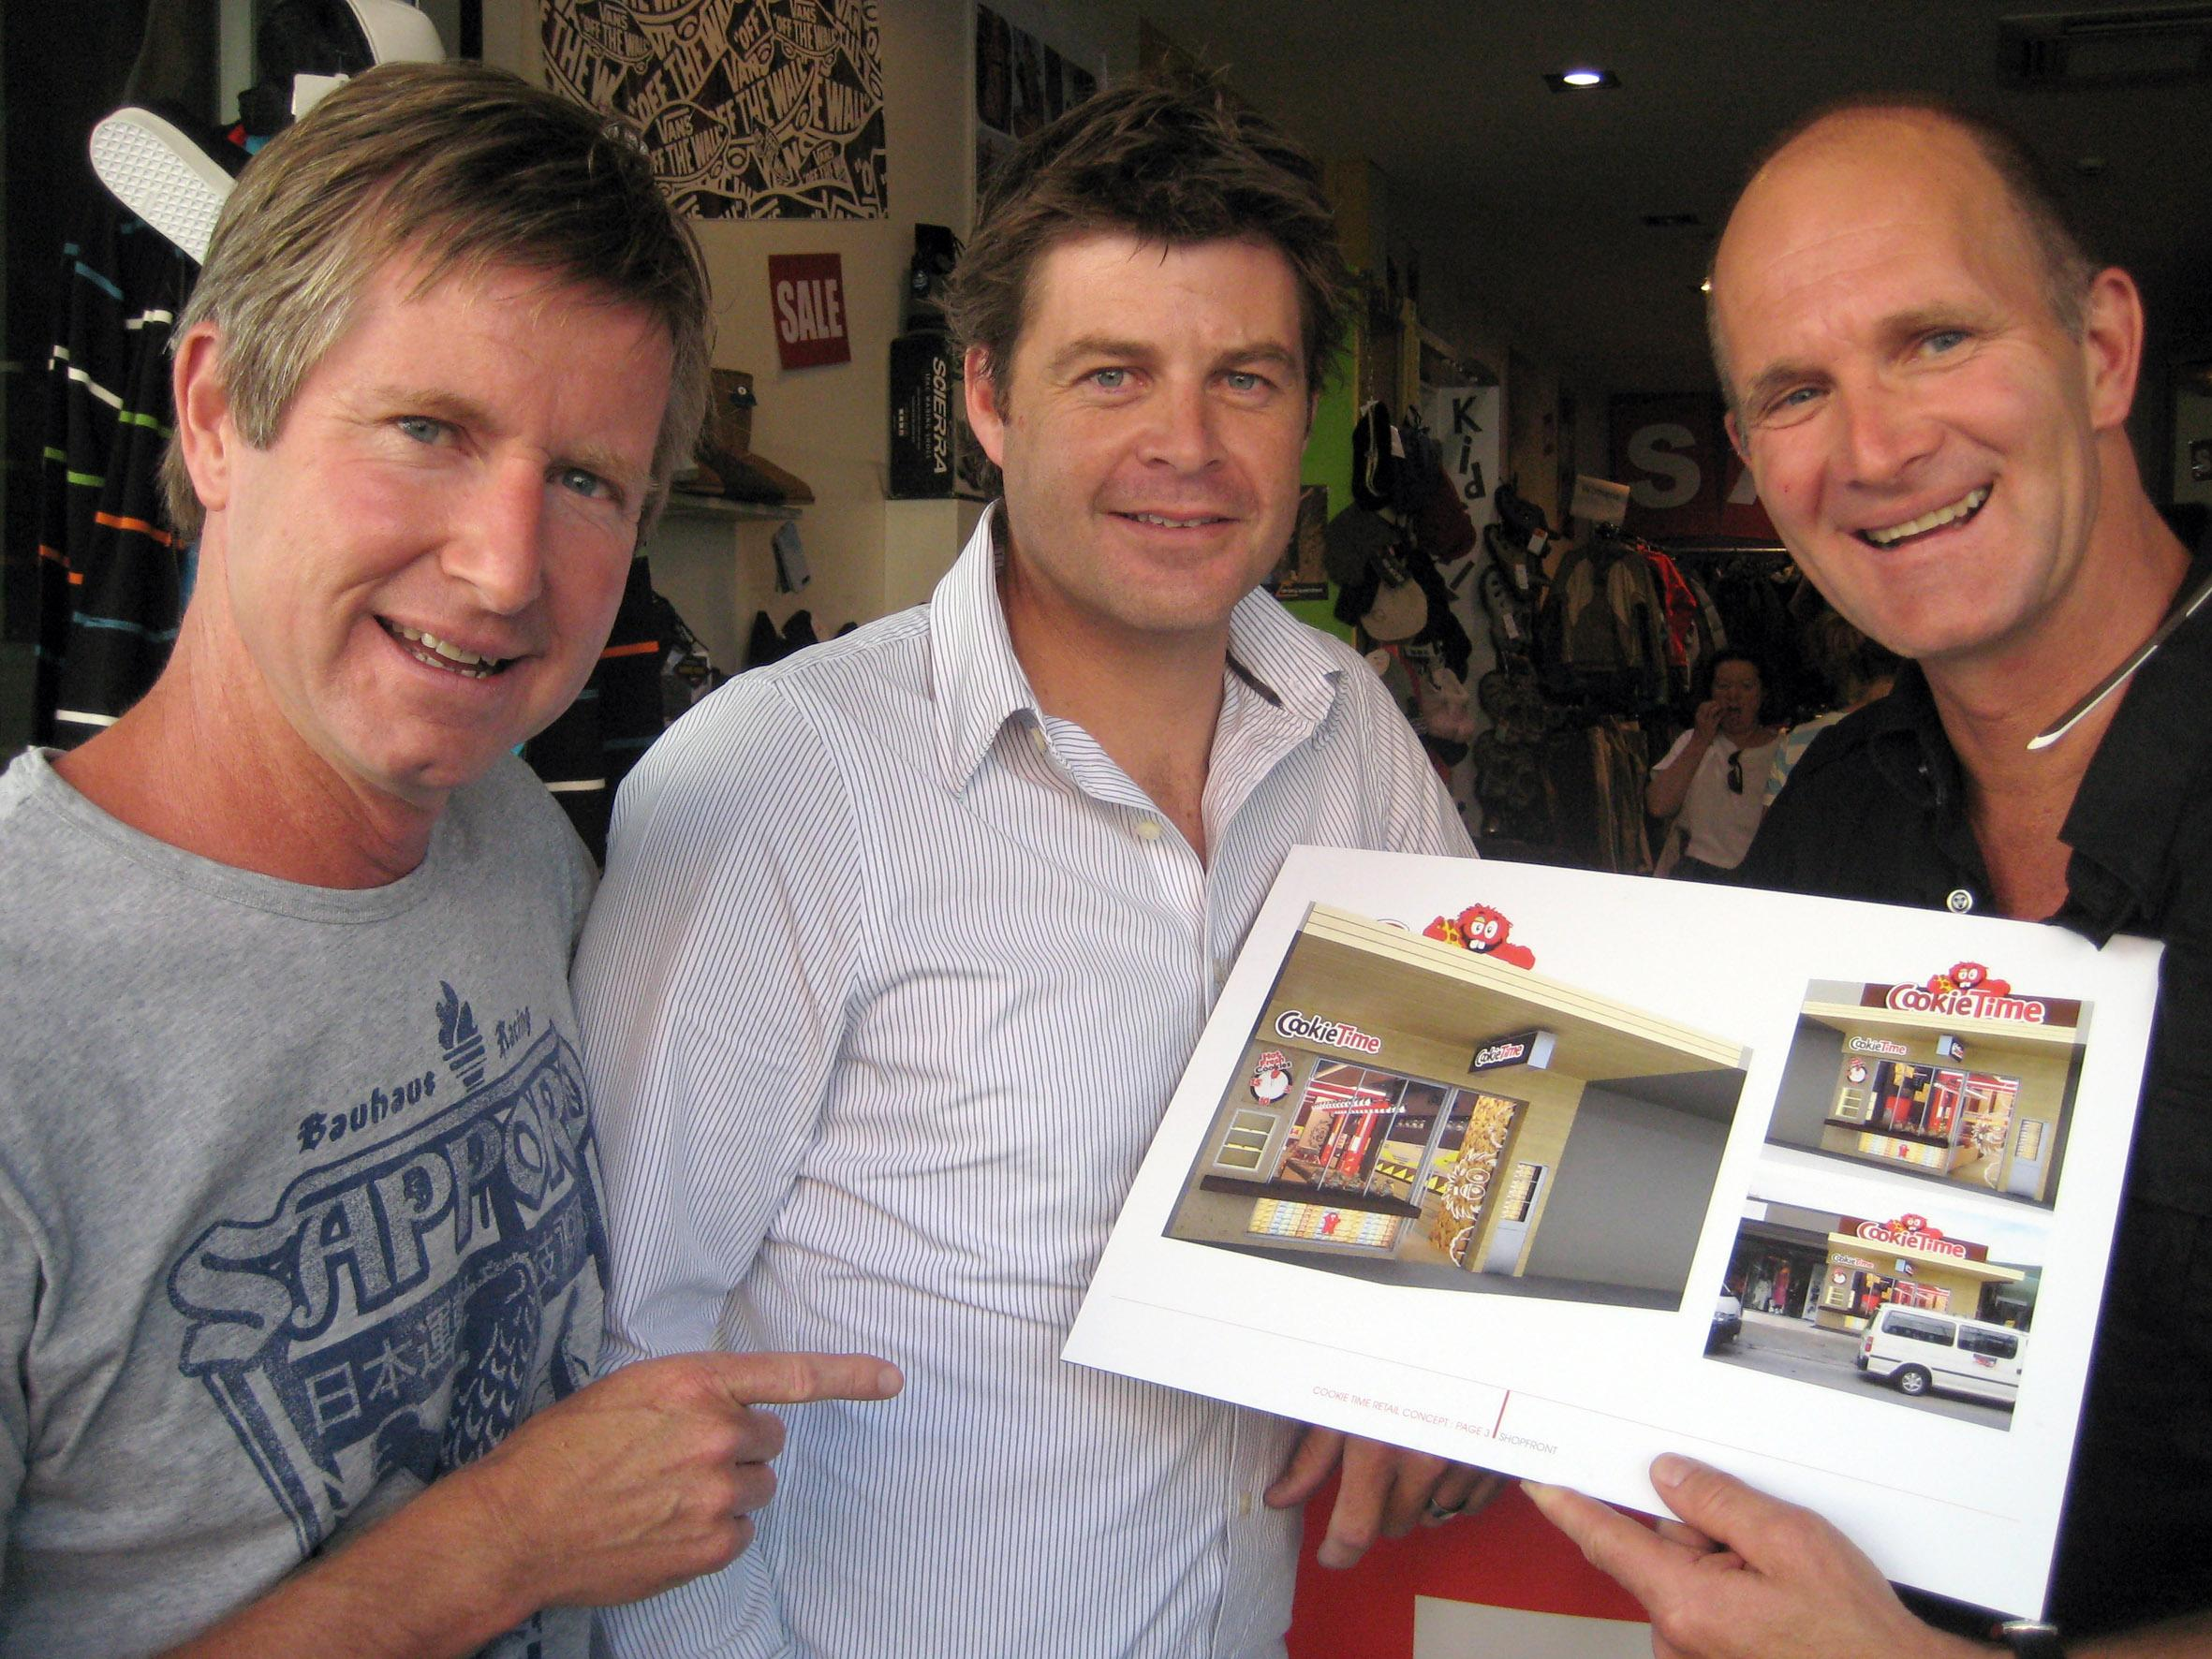 T shirt design queenstown - Cookie Time To Open Showcase Store In Queenstown